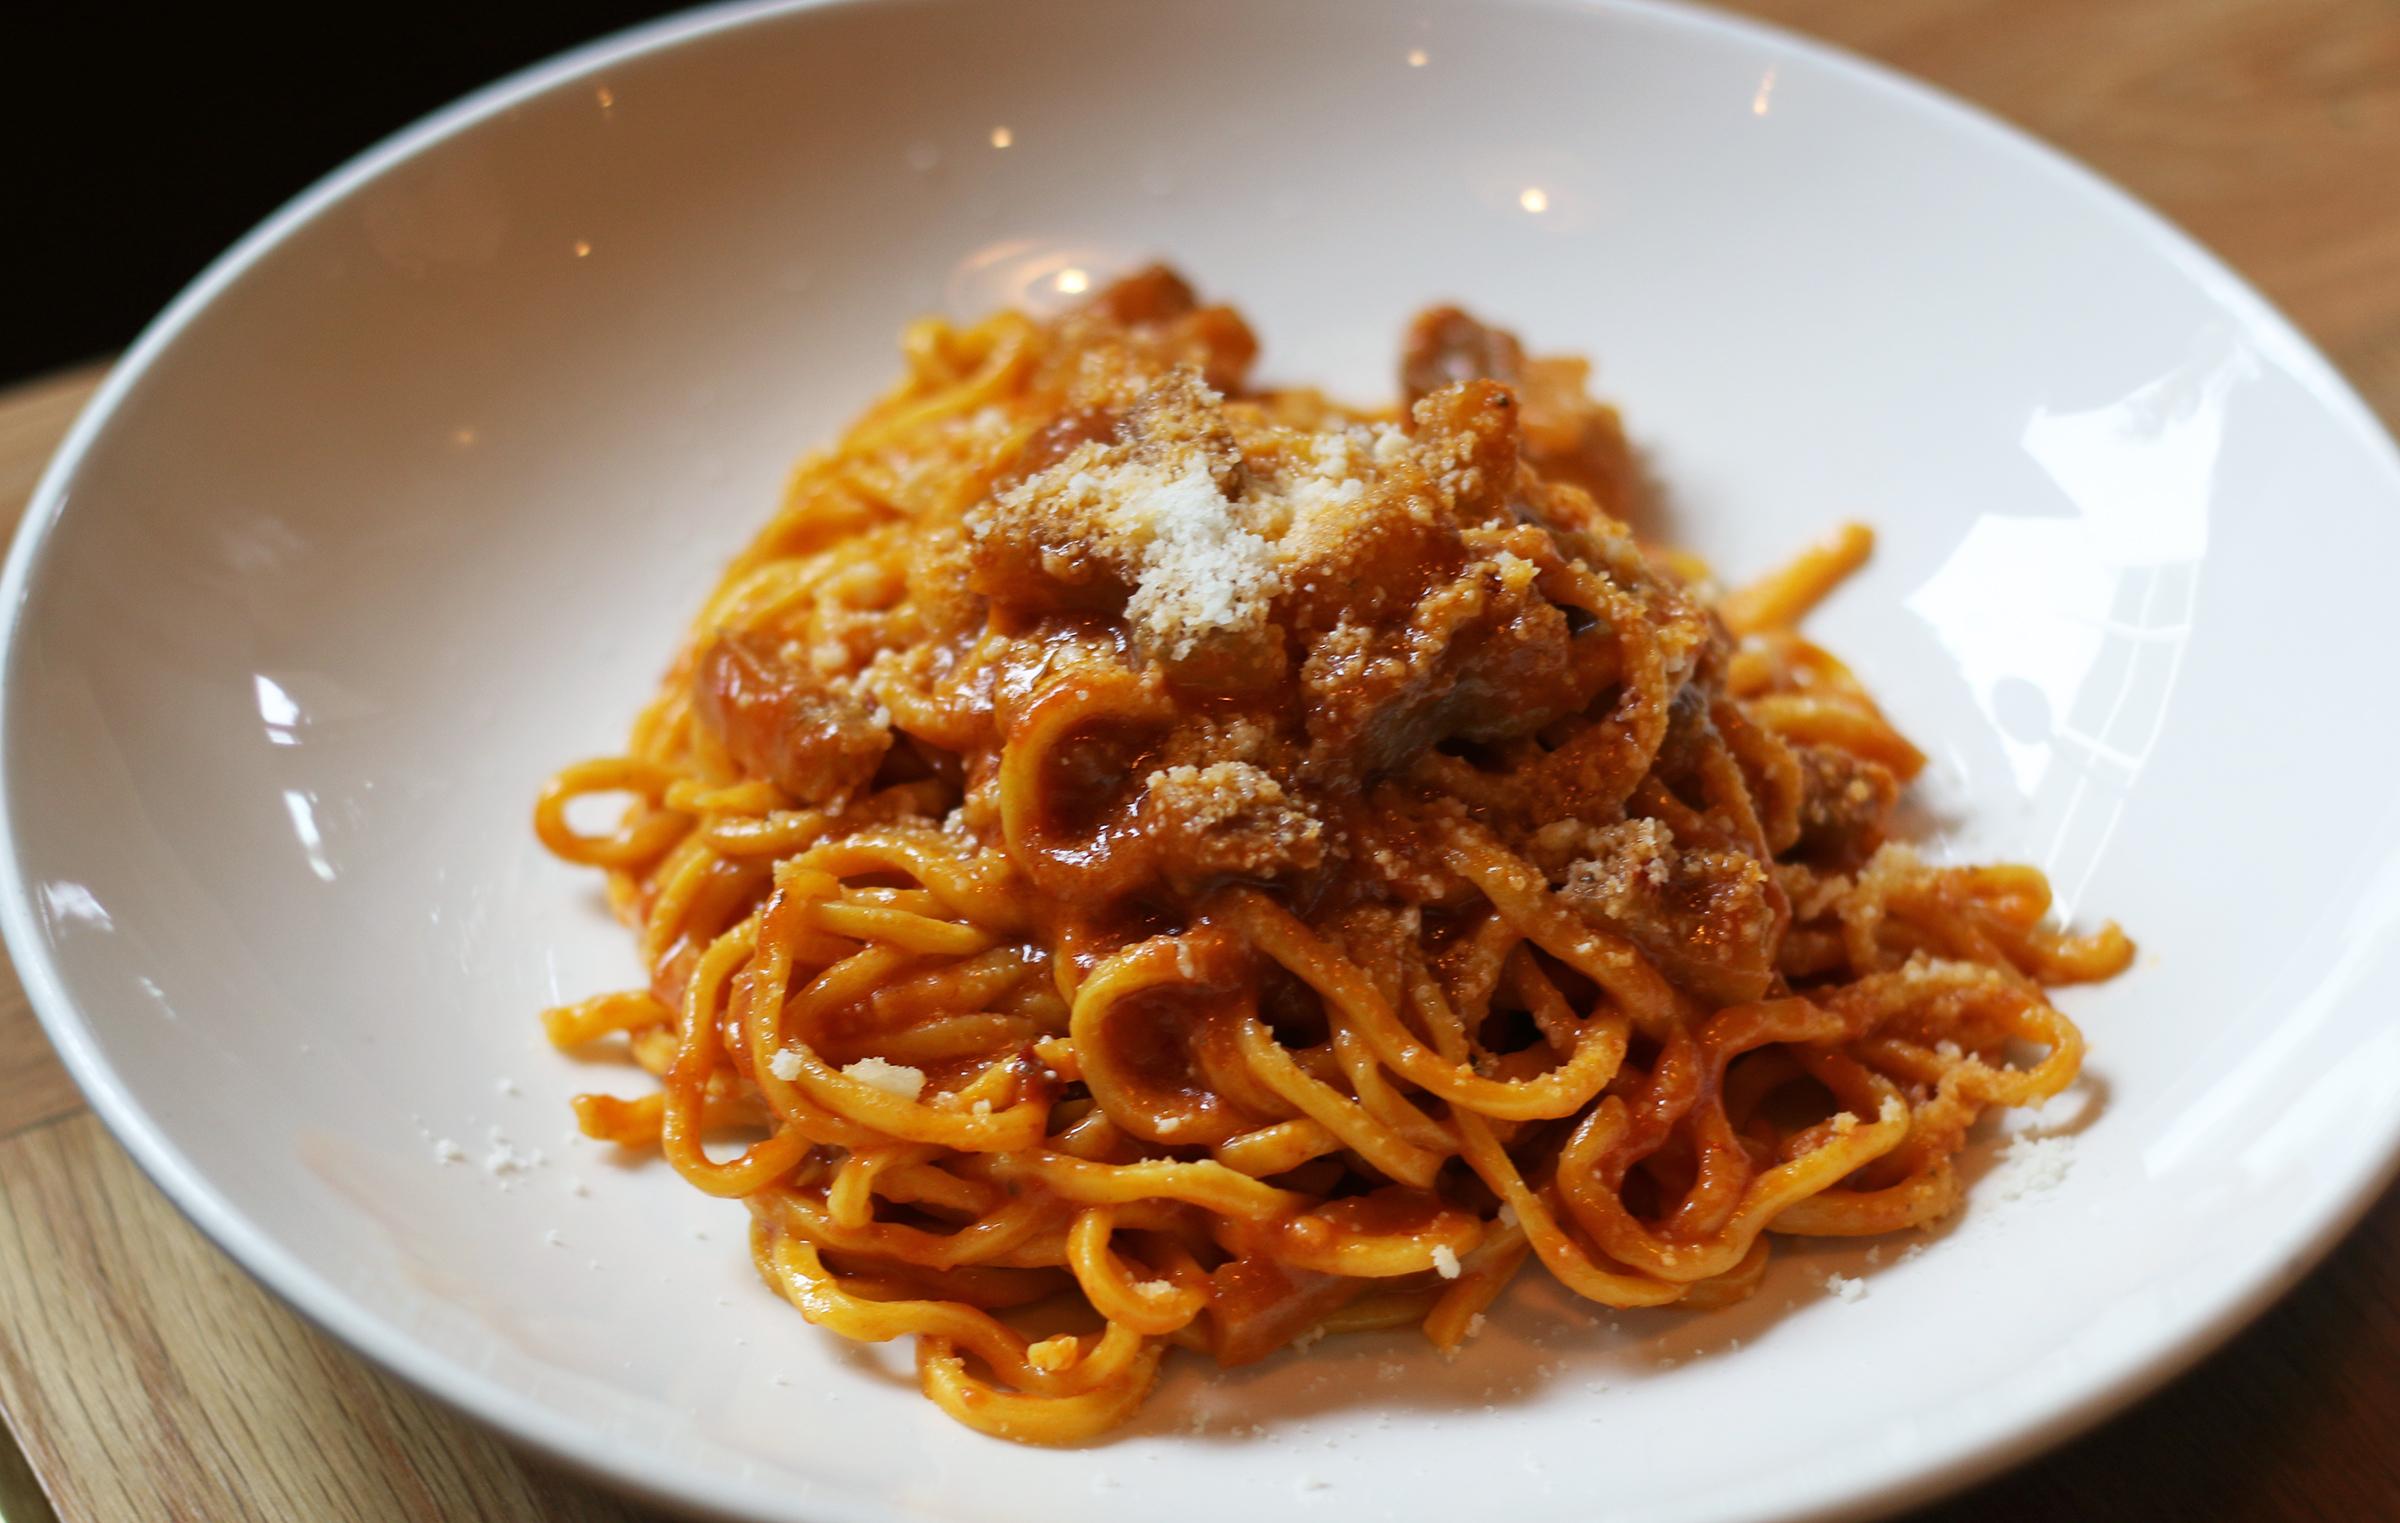 Tonnarelli all'Amatriciana:Imported tomatoes, pecorino, onion, guanciale & red chili pepper